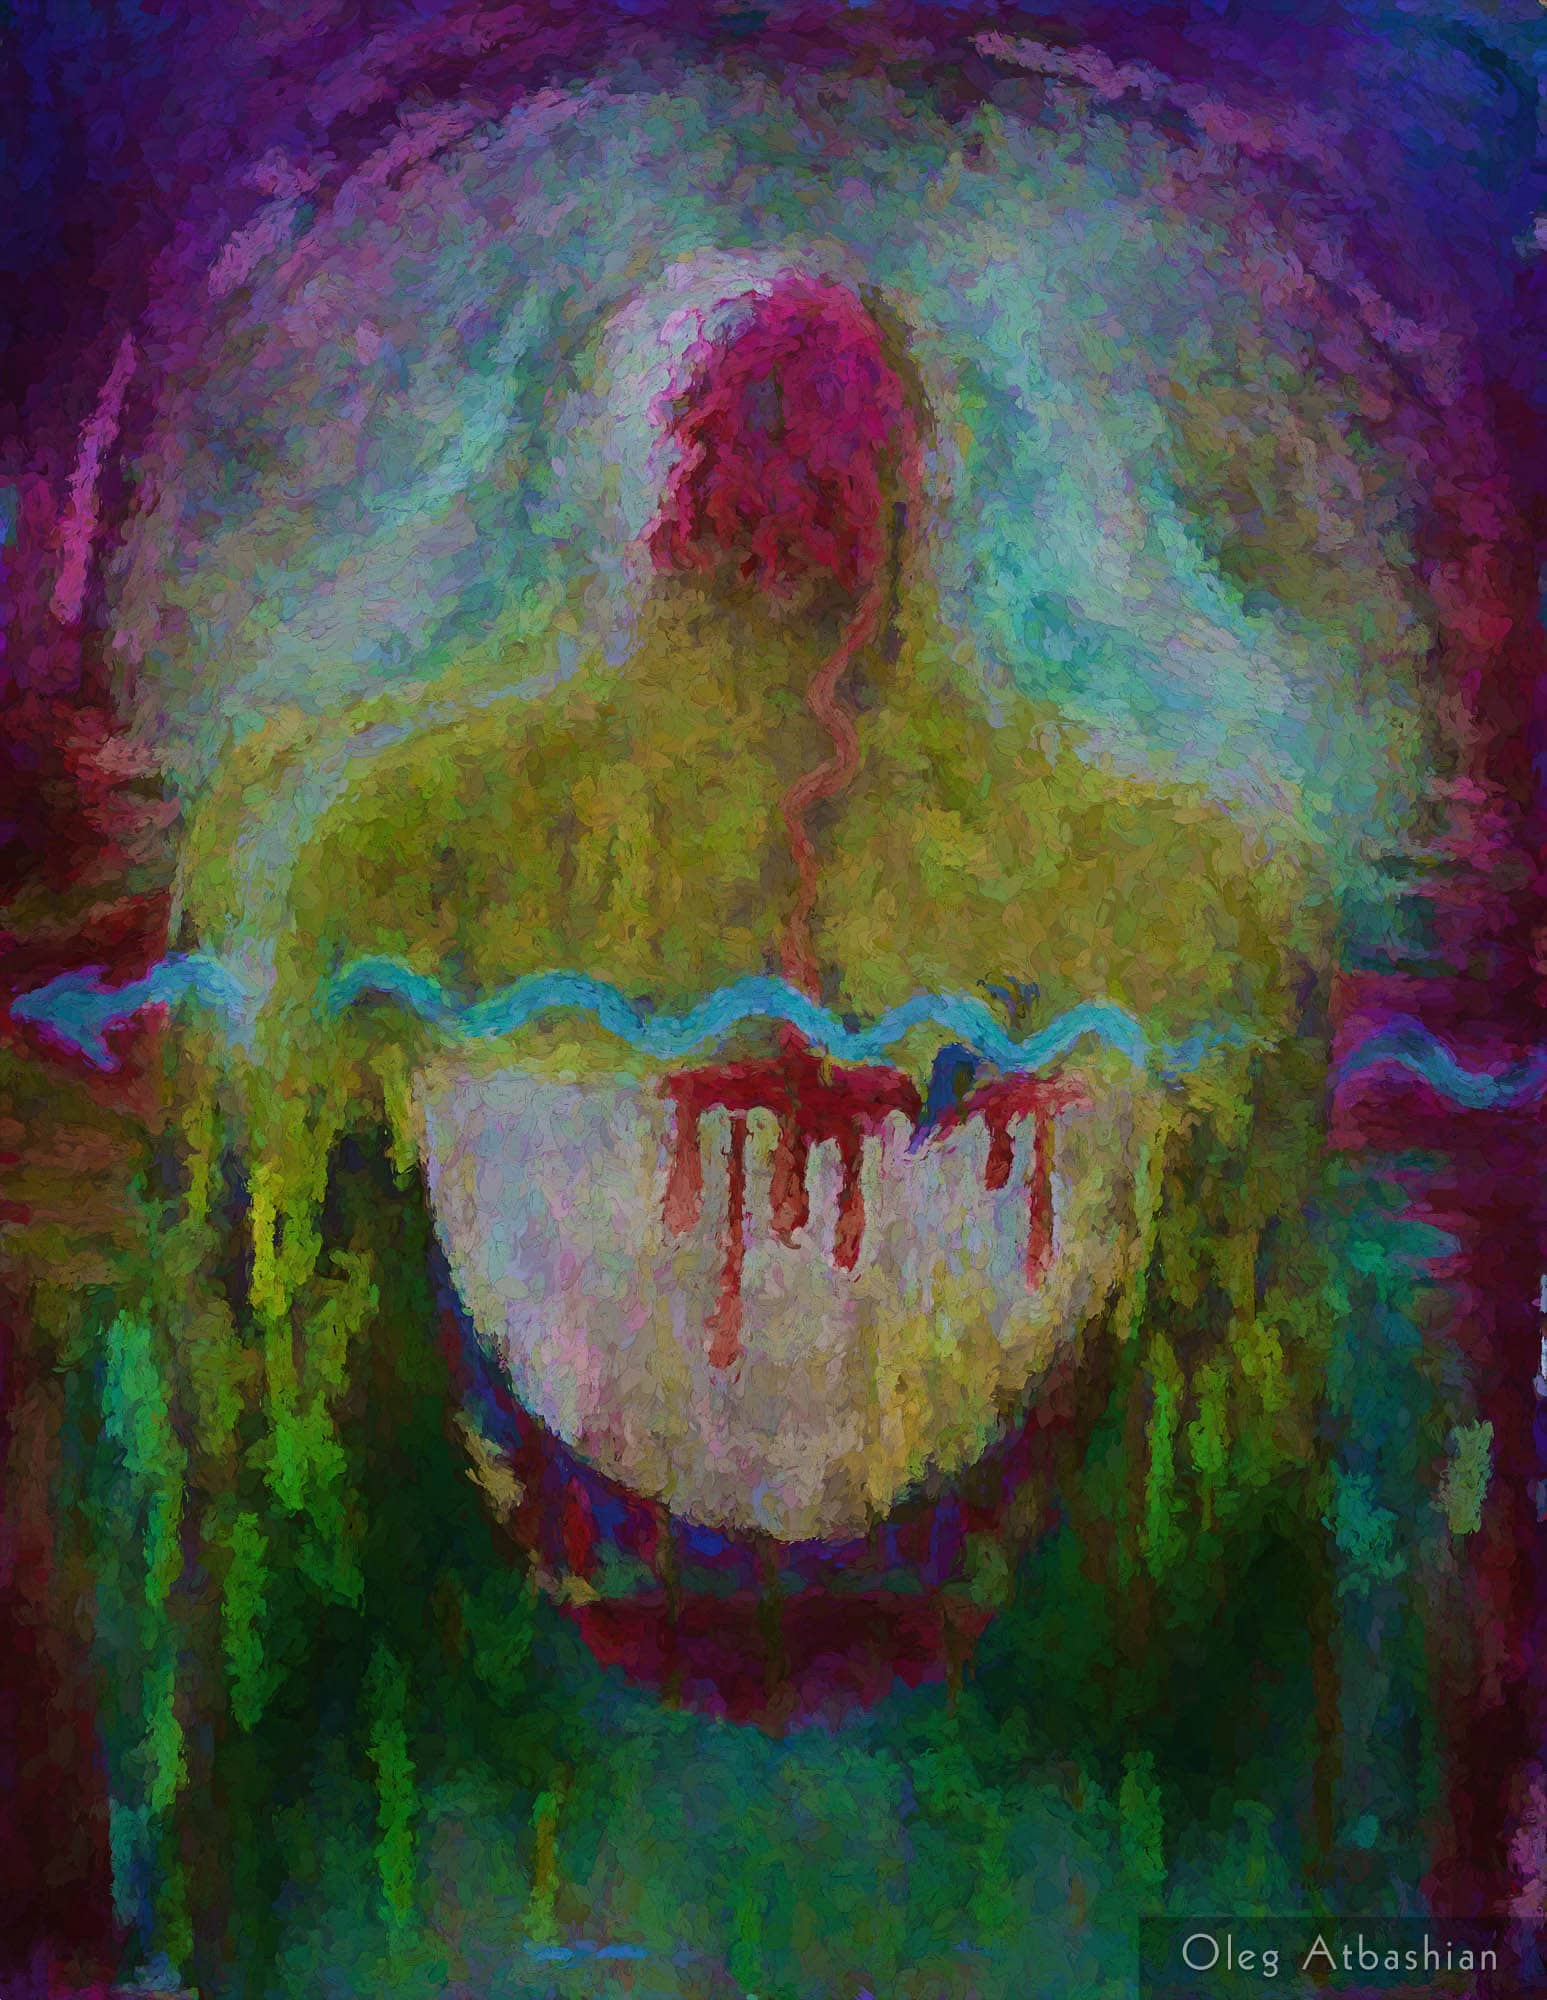 Splinter in the Heart, Painting